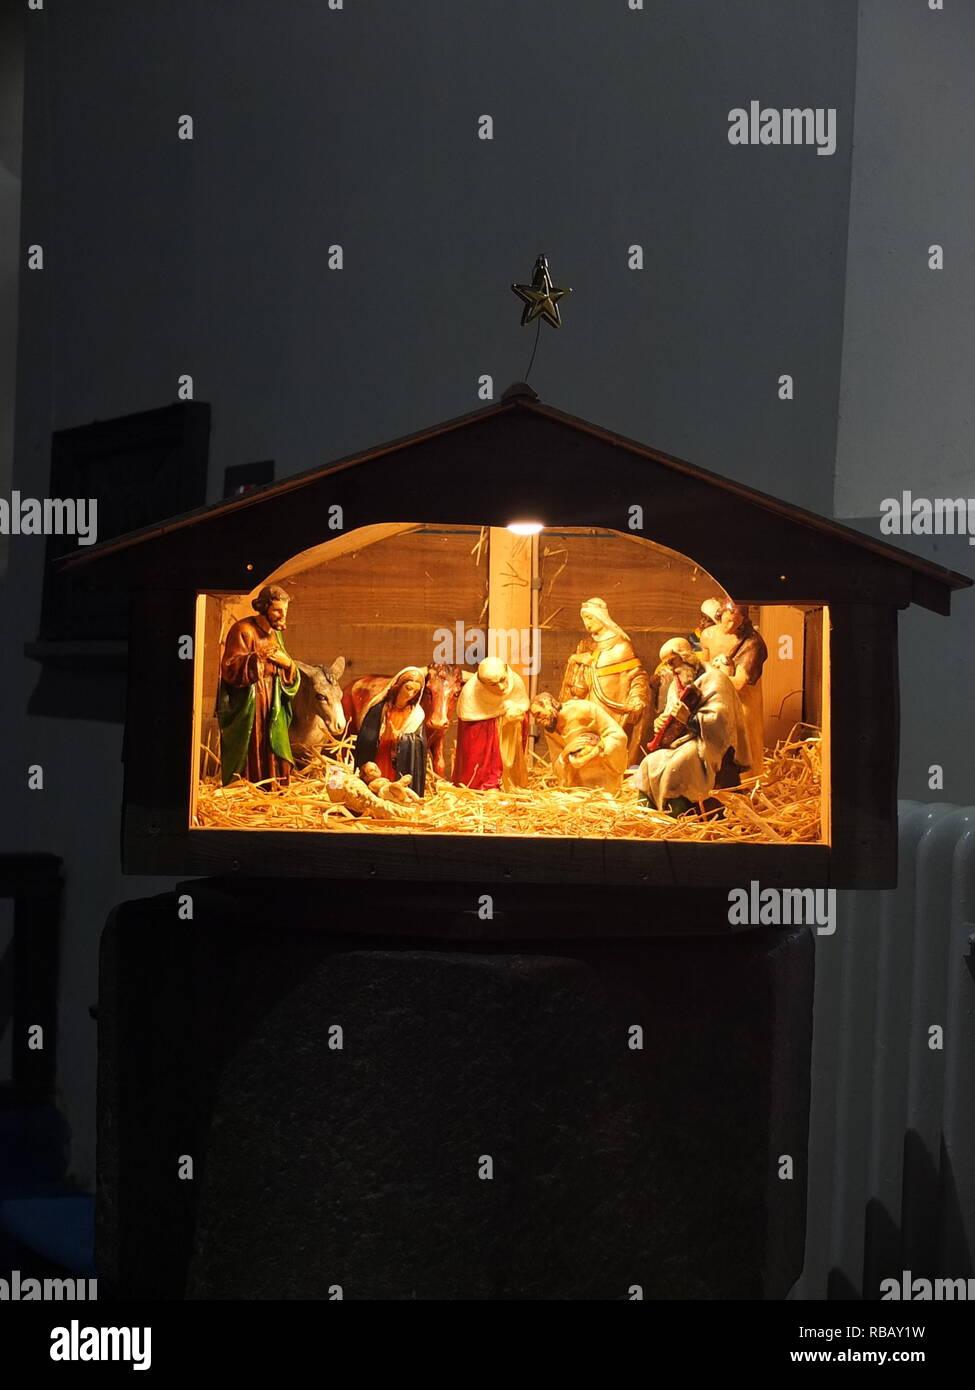 Illuminated crib nativity scene in a church for Christmas (St Edmunds Church, Castleton, Derbyshire, UK) Stock Photo